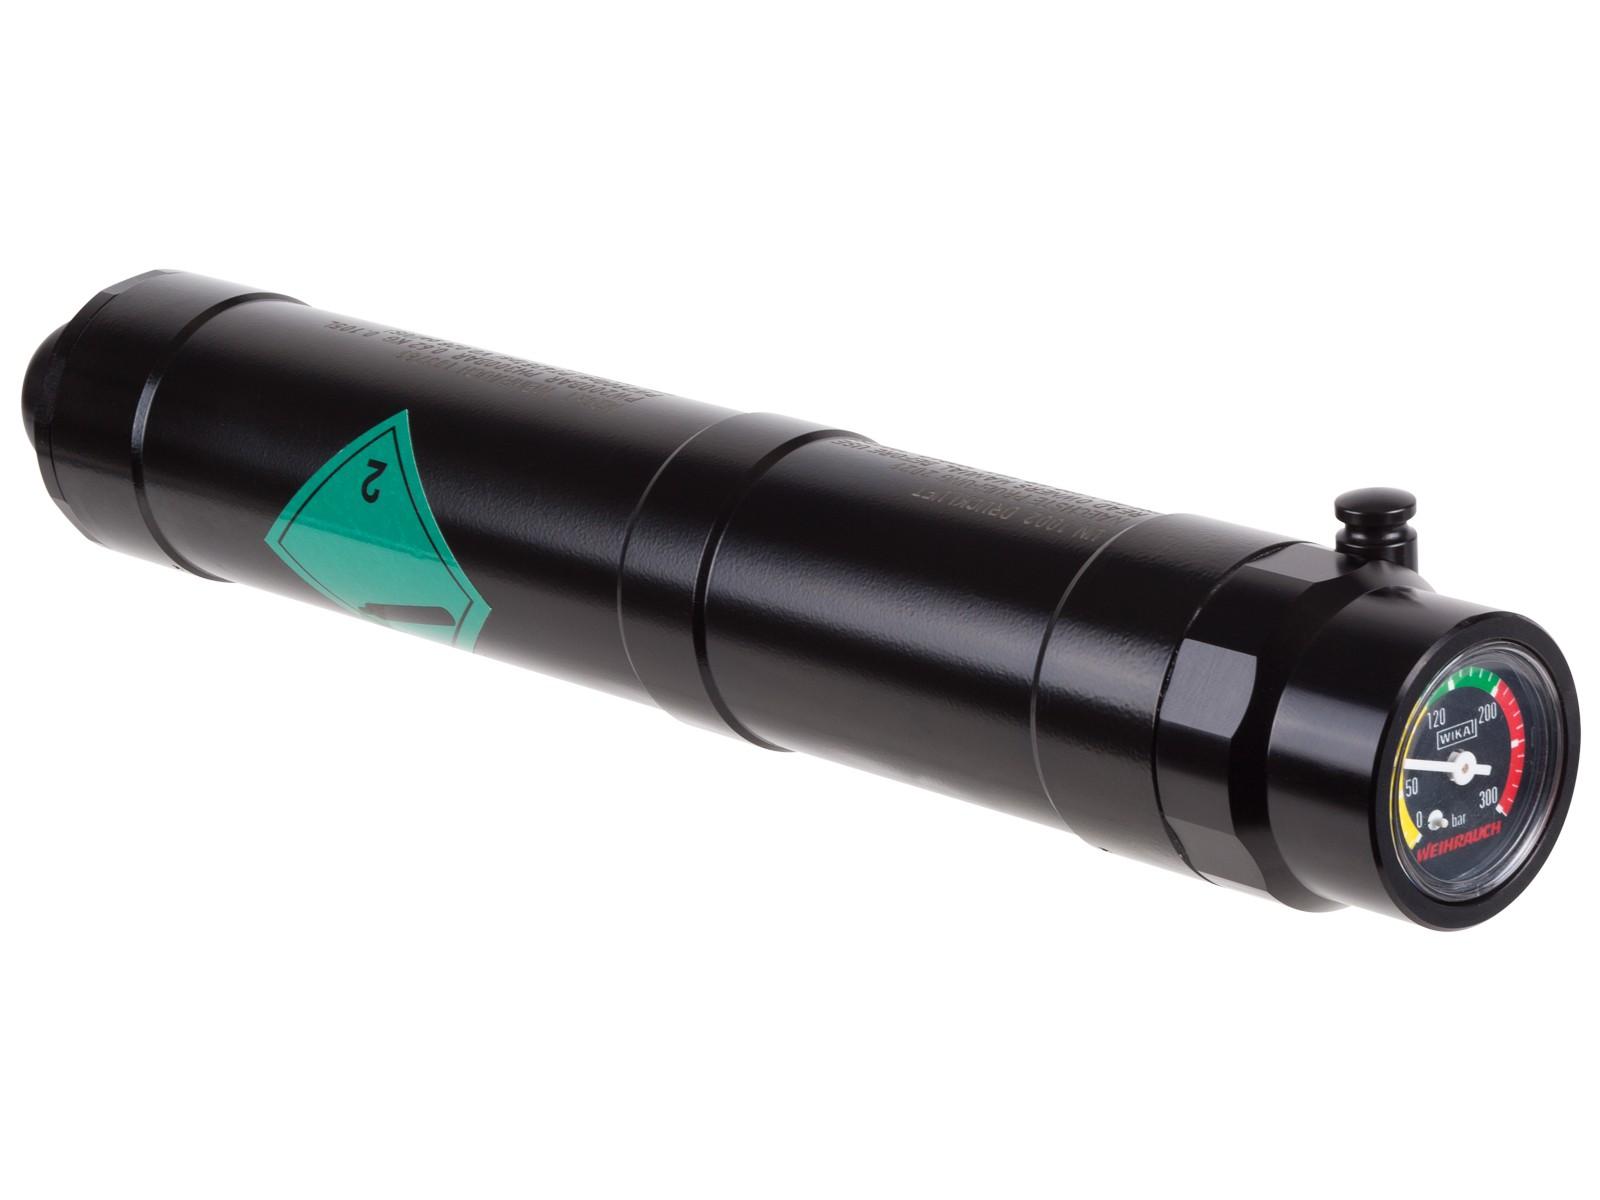 Beeman/HW Carbine Air